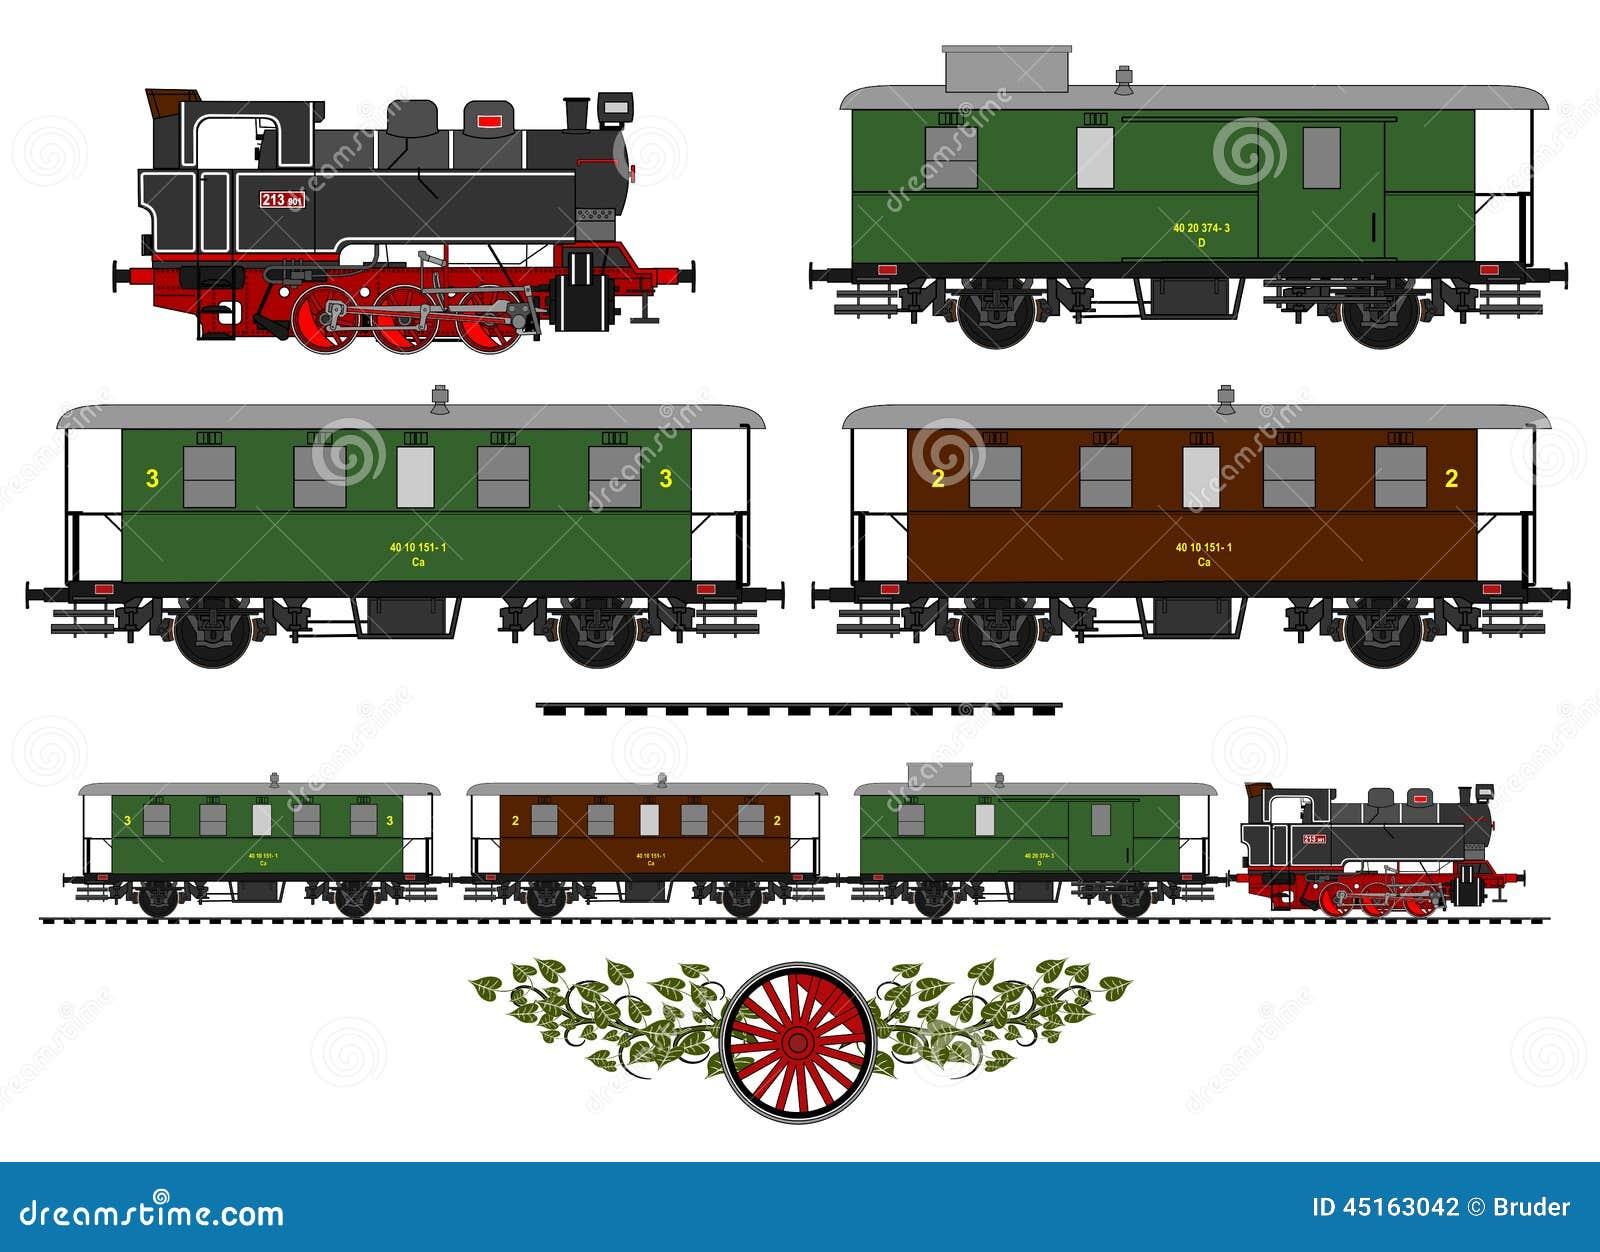 Vintage Train Stock Vector - Image: 45163042